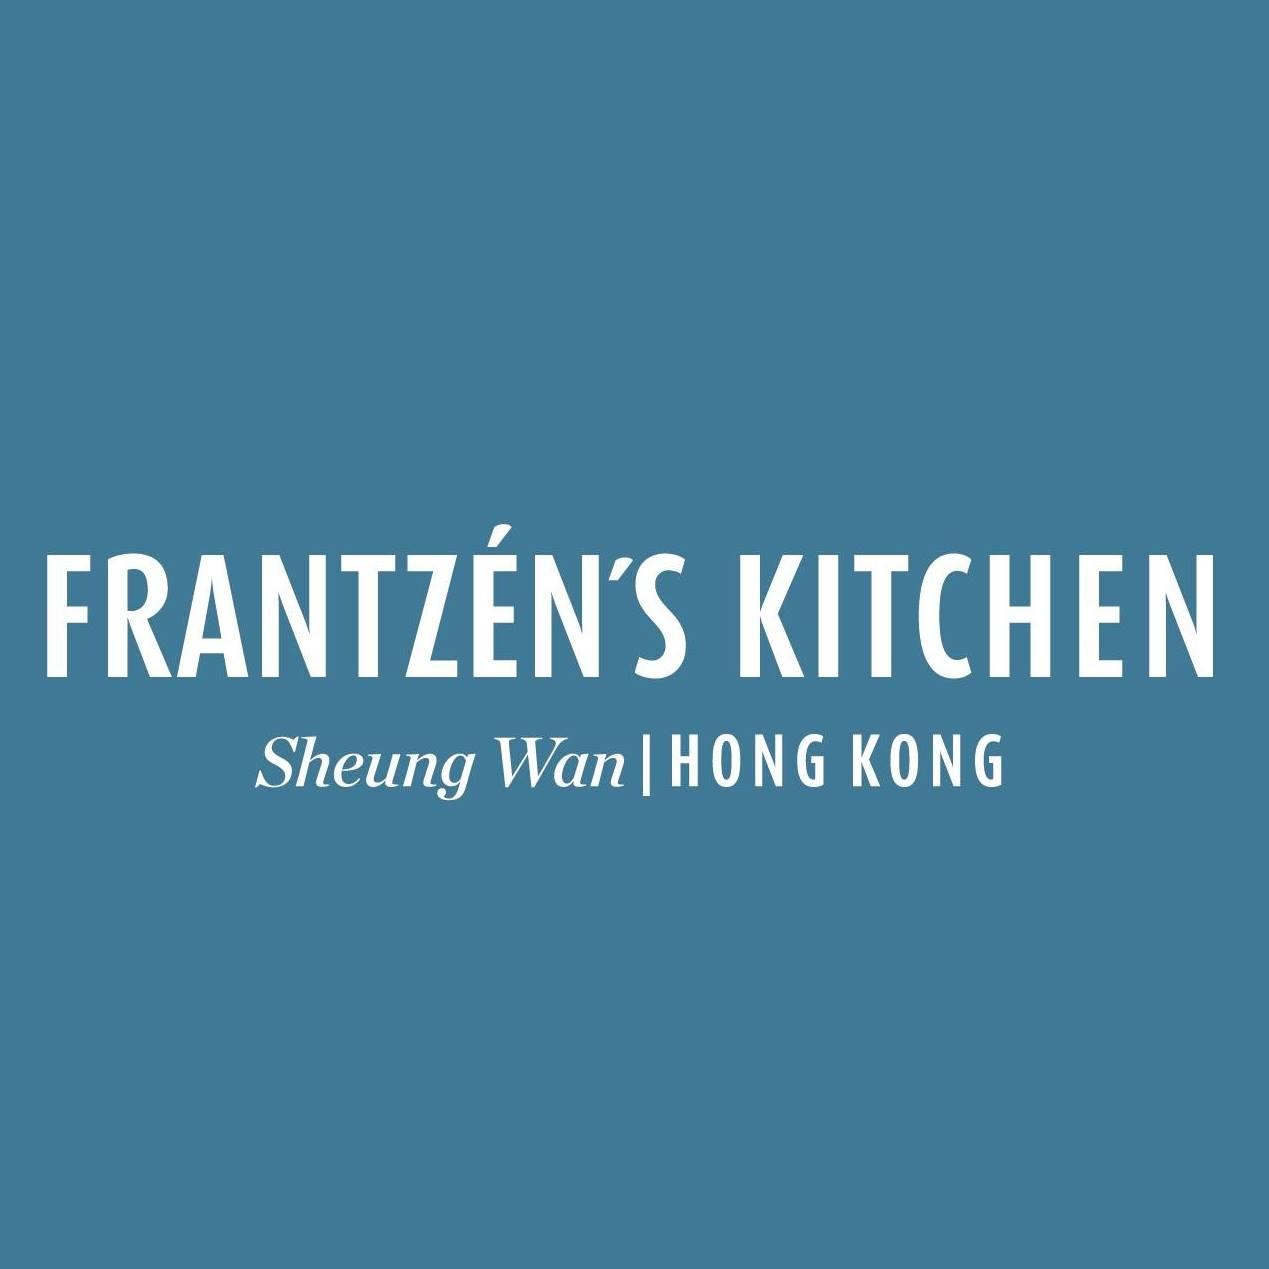 Frantzen's Kitchen